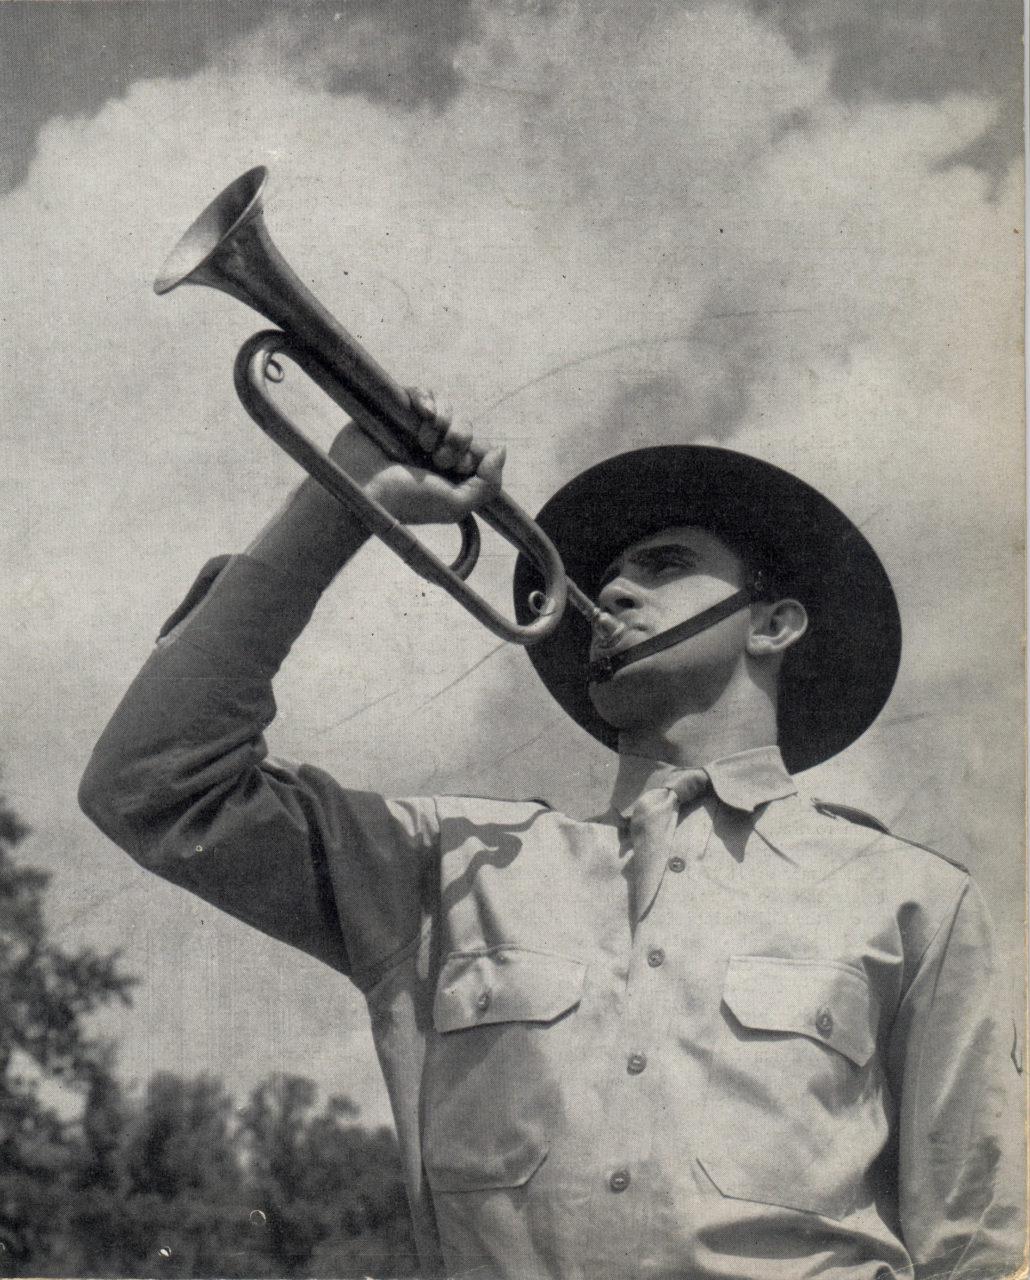 wwii bugler